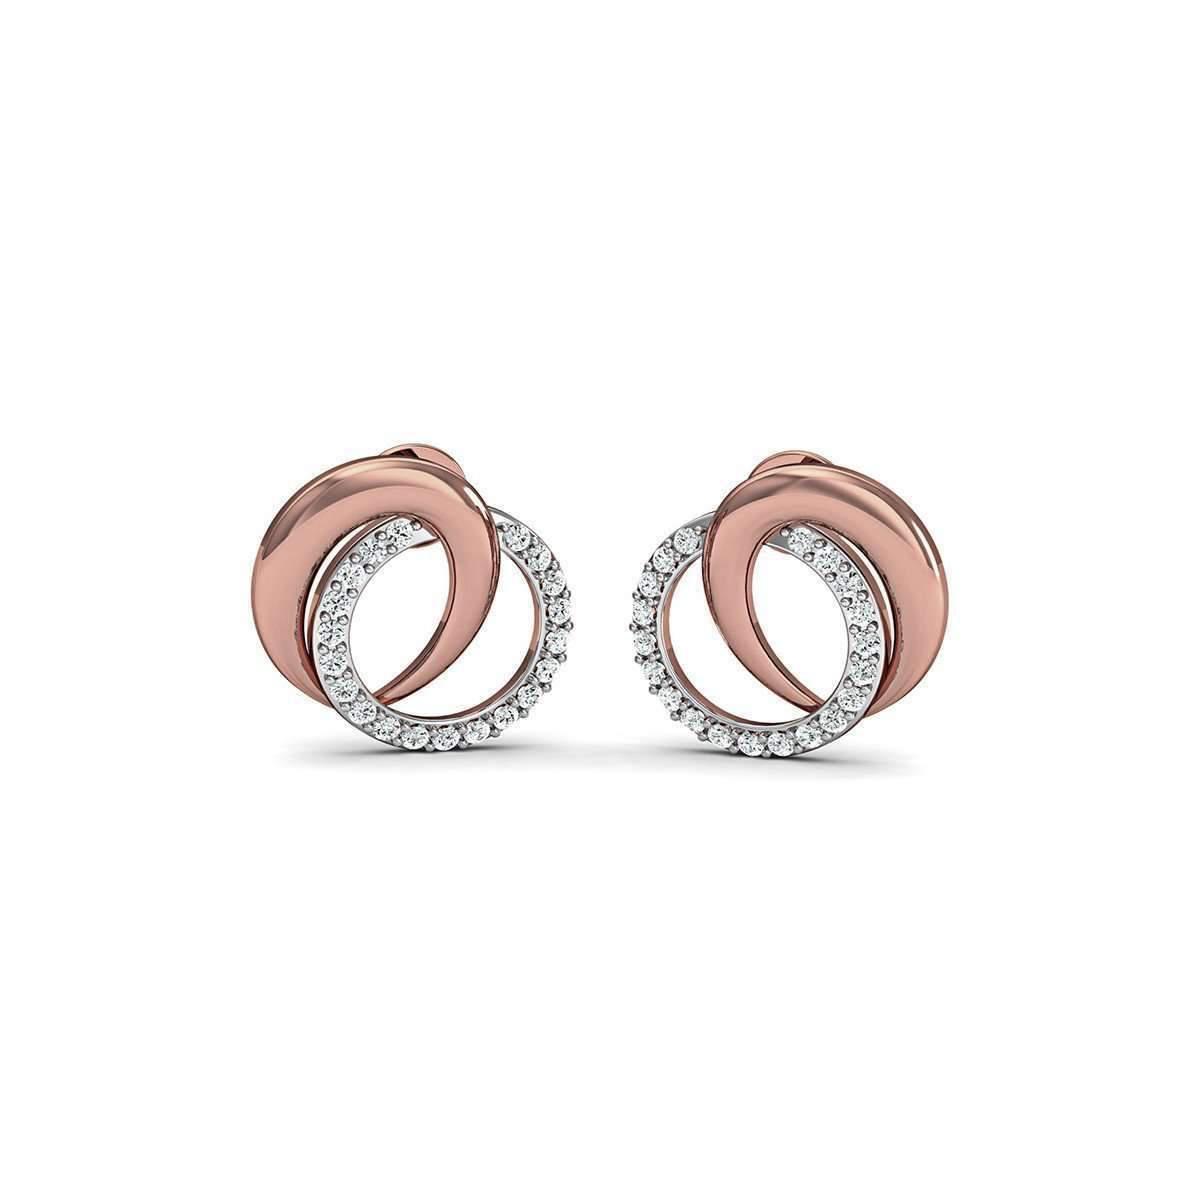 Diamoire Jewels Premium Diamond Earrings Nature Inspired in 18kt Rose Gold jDdk8QkIK